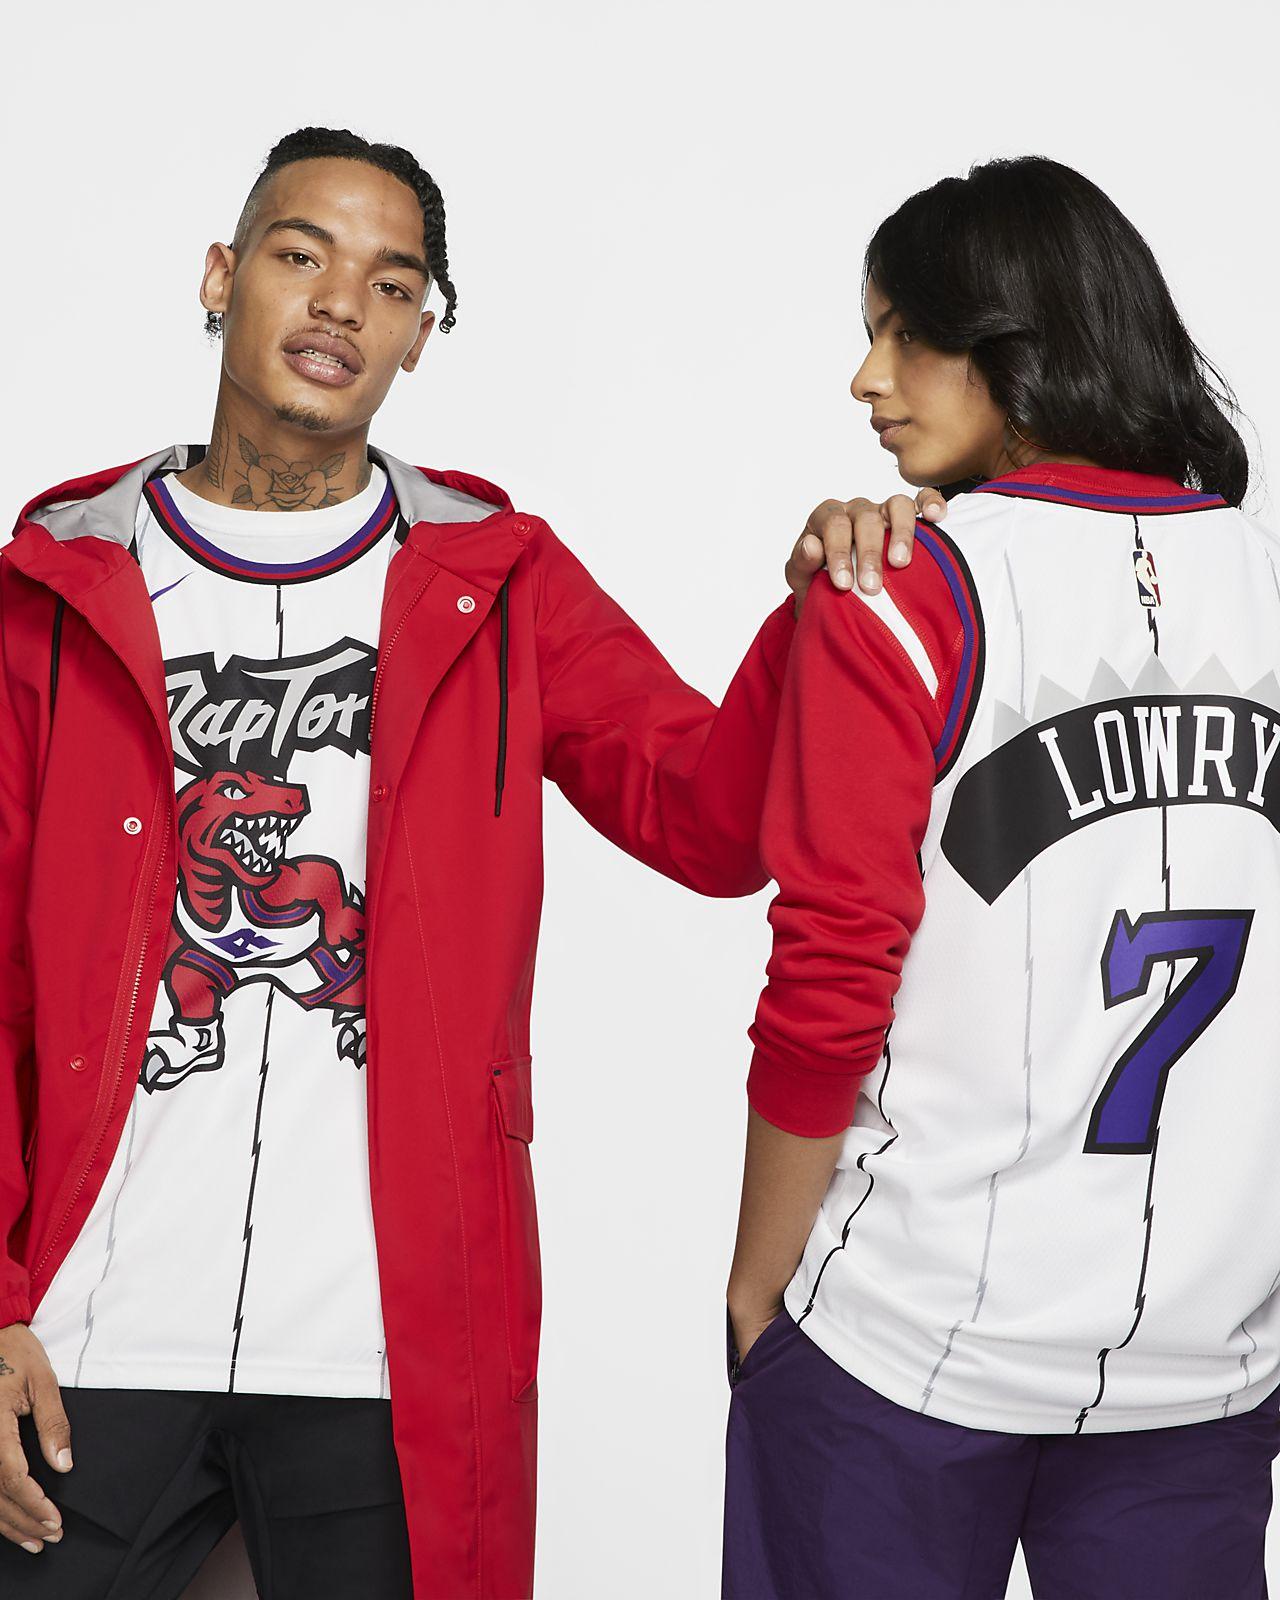 Kyle Lowry Raptors Classic Edition Nike NBA Swingman Trikot